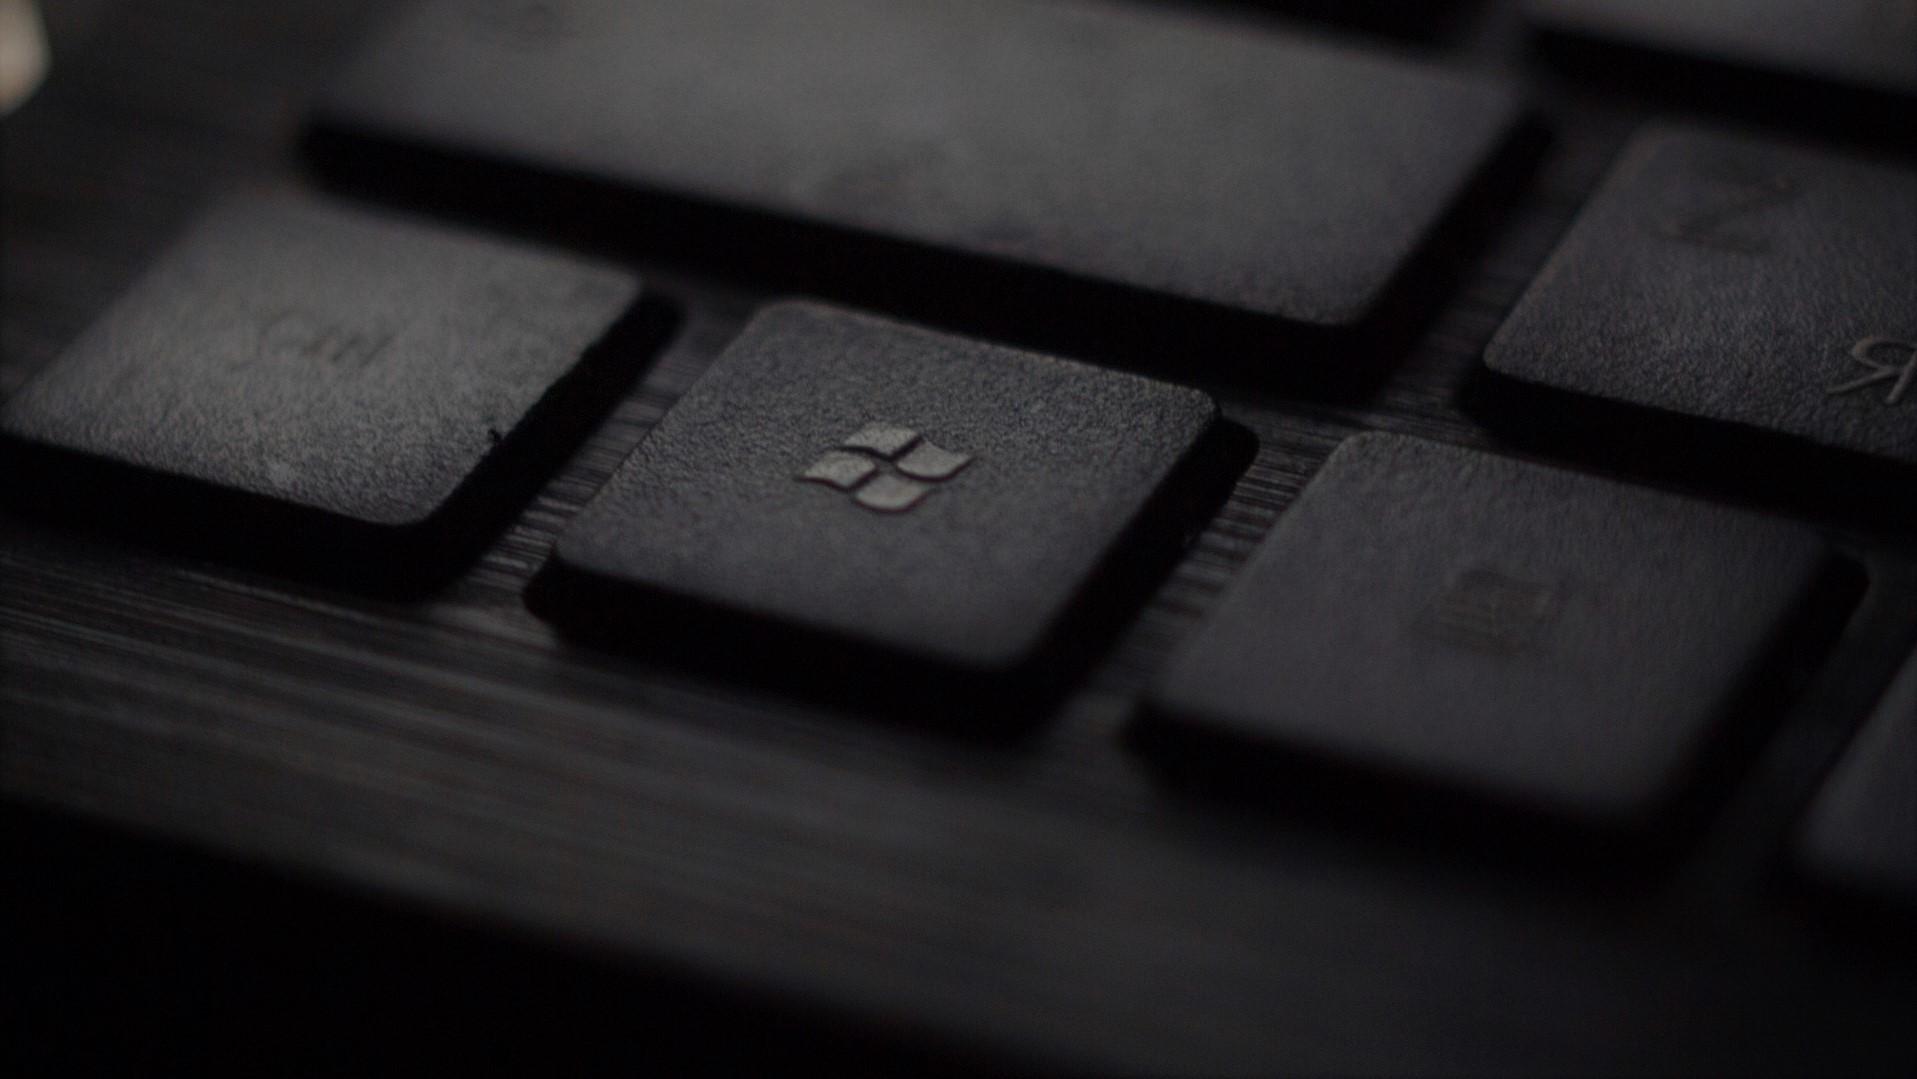 Email Industry News: Microsoft 365 Blocking Google's & LinkedIn's Domain